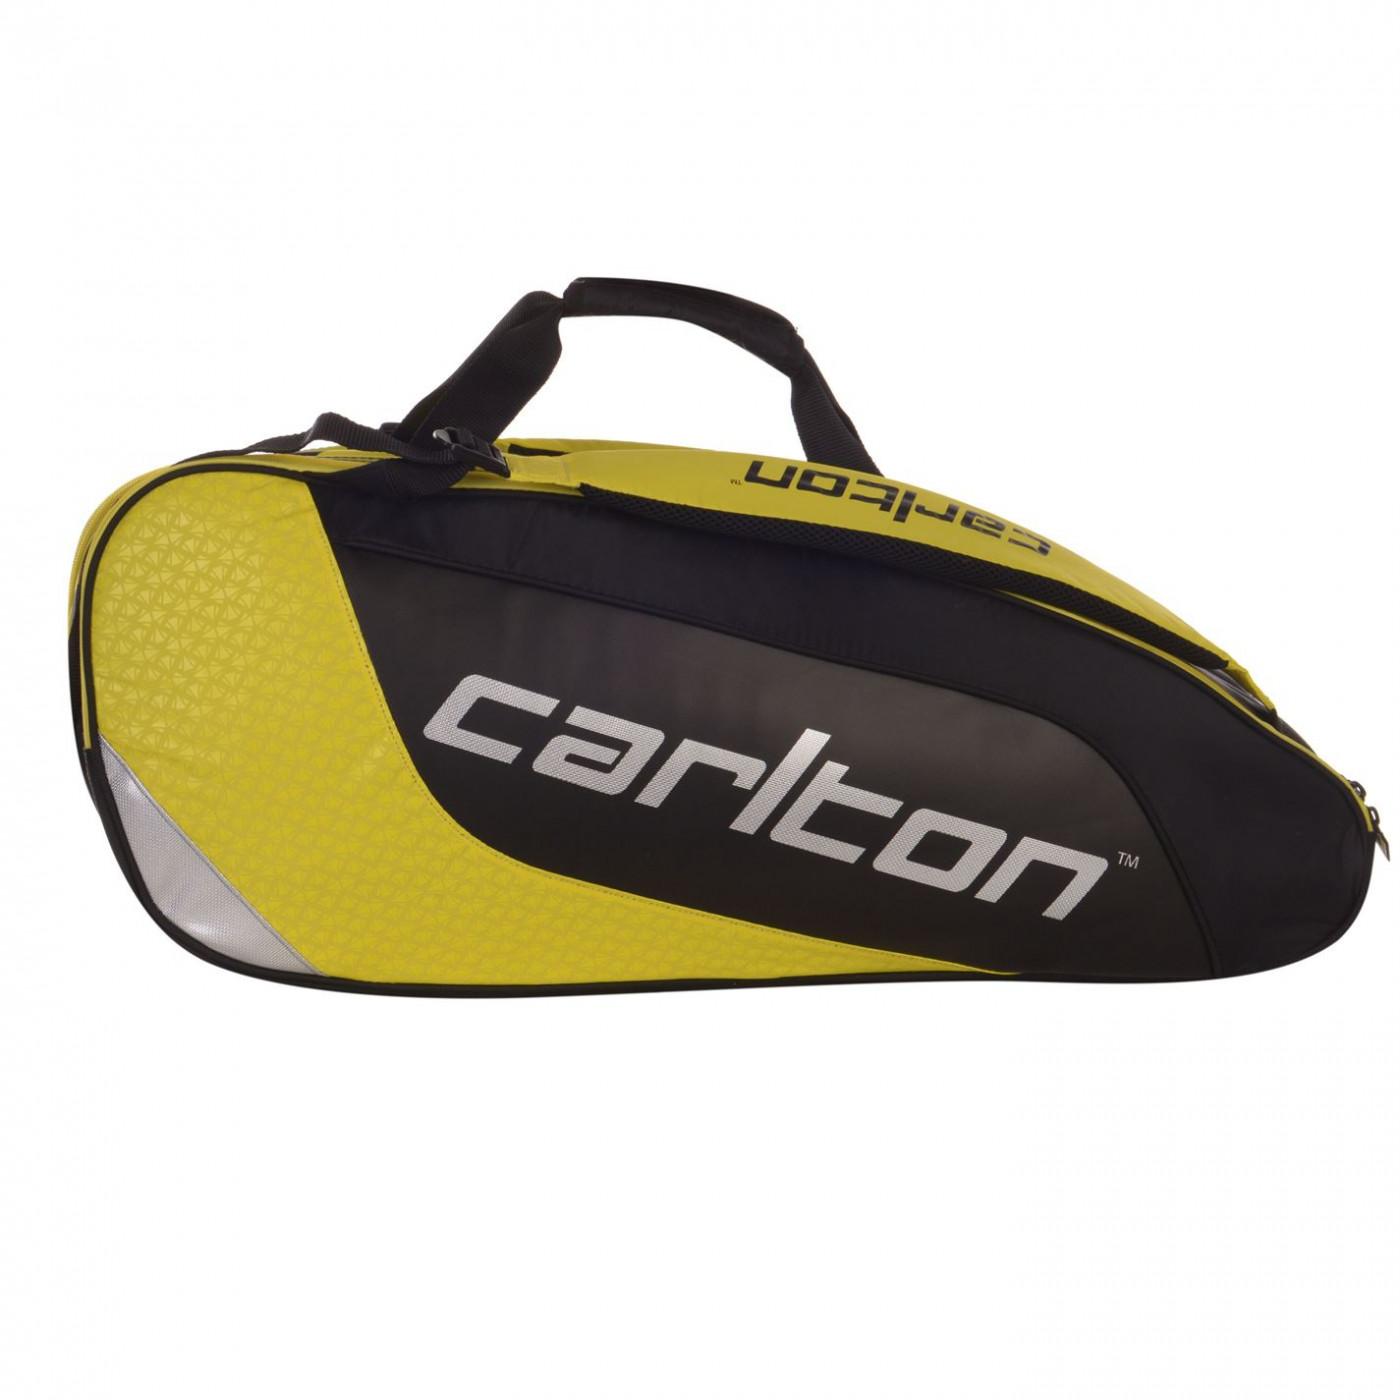 Carlton Tour 2 Competition Badminton Racket Bag